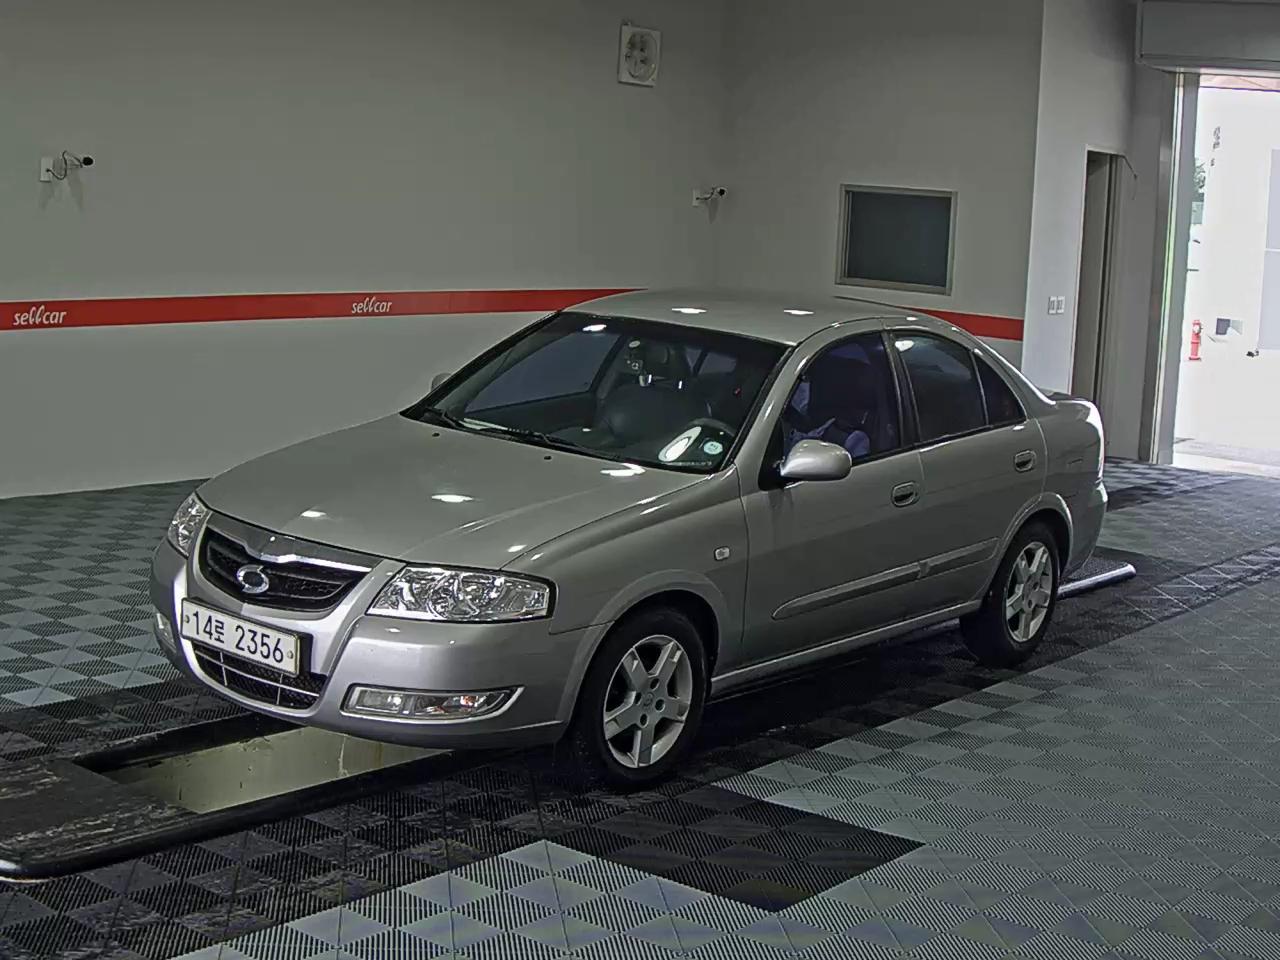 1276 Renault Samsung New Generation SM3 05-11 SE 16 Plus